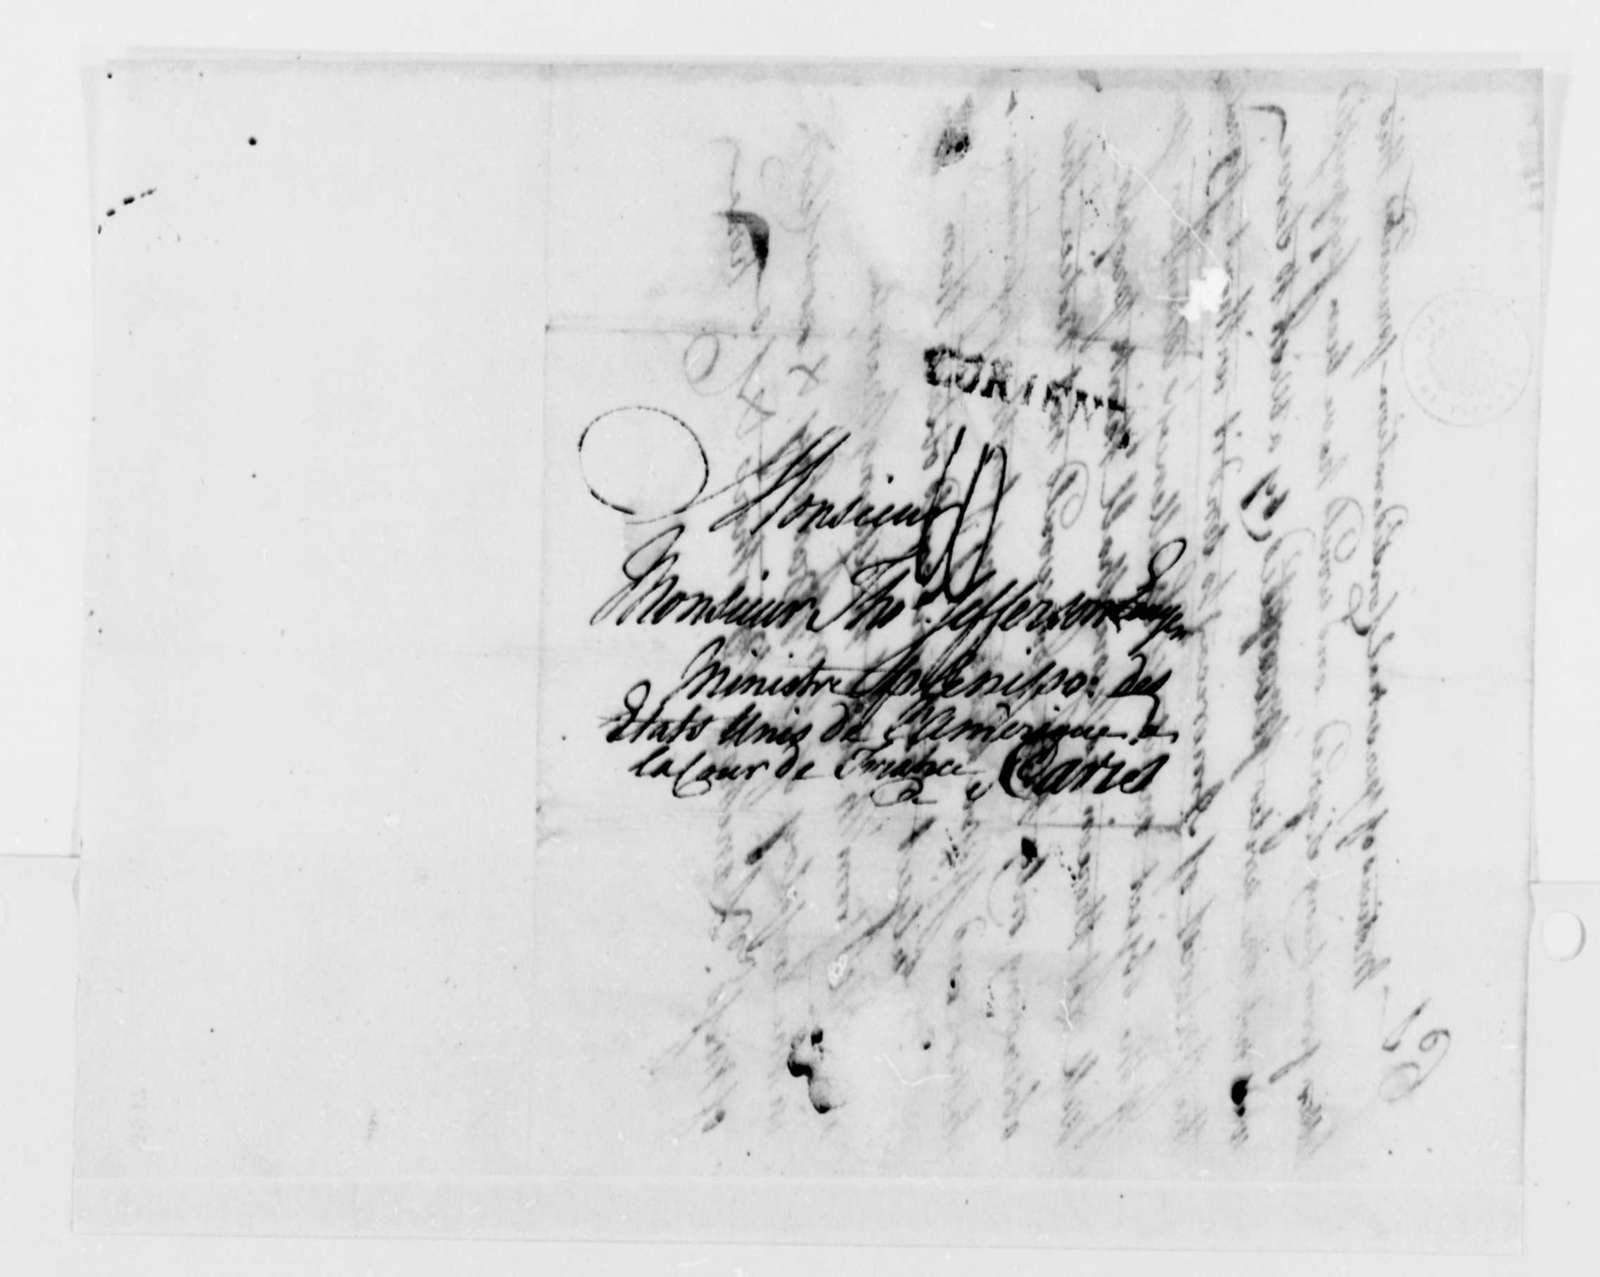 Lanchon Freres & Company to Thomas Jefferson, November 23, 1787